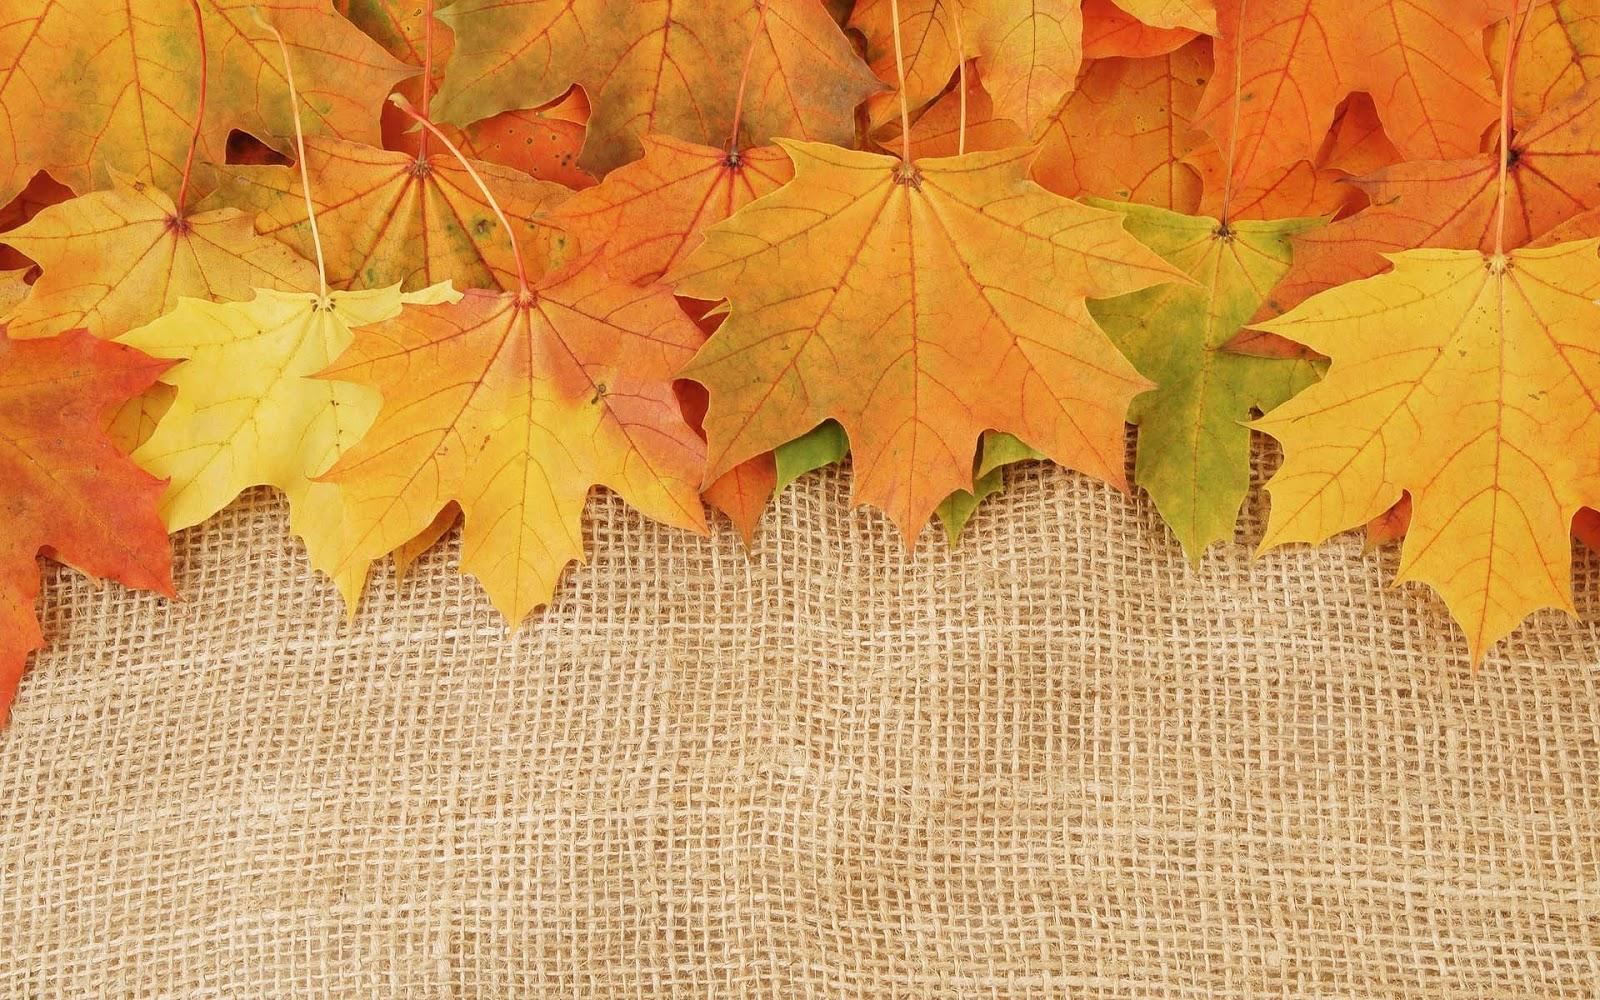 http://4.bp.blogspot.com/-DOIizdYkW2g/UIf_iOF04RI/AAAAAAAAH5A/vijN8b1LG_U/s1600/herfst-wallpaper-met-herfstbladeren.jpg